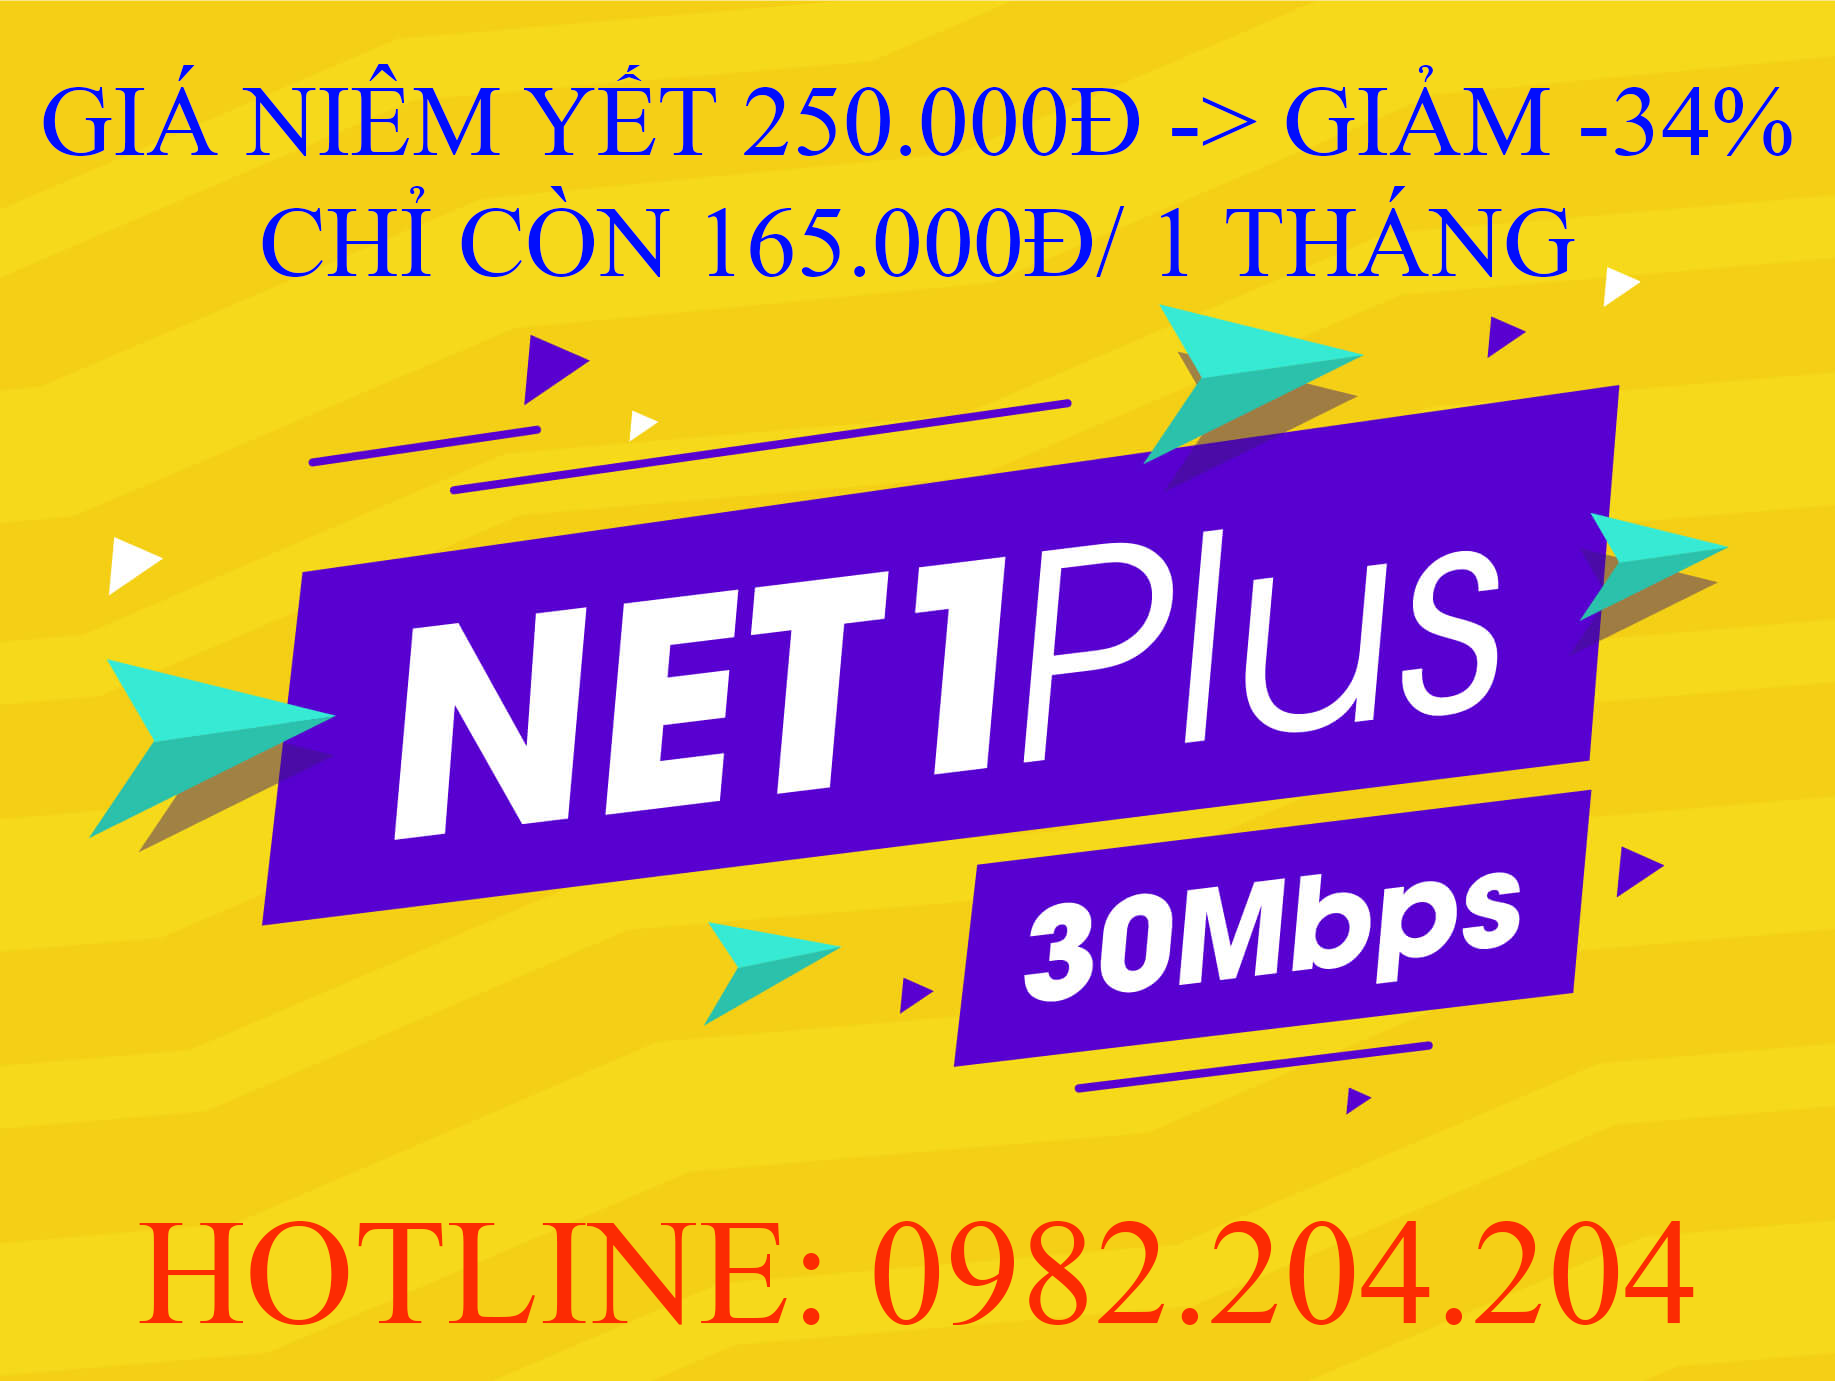 Lắp mạng Viettel gói Net 1 Plus